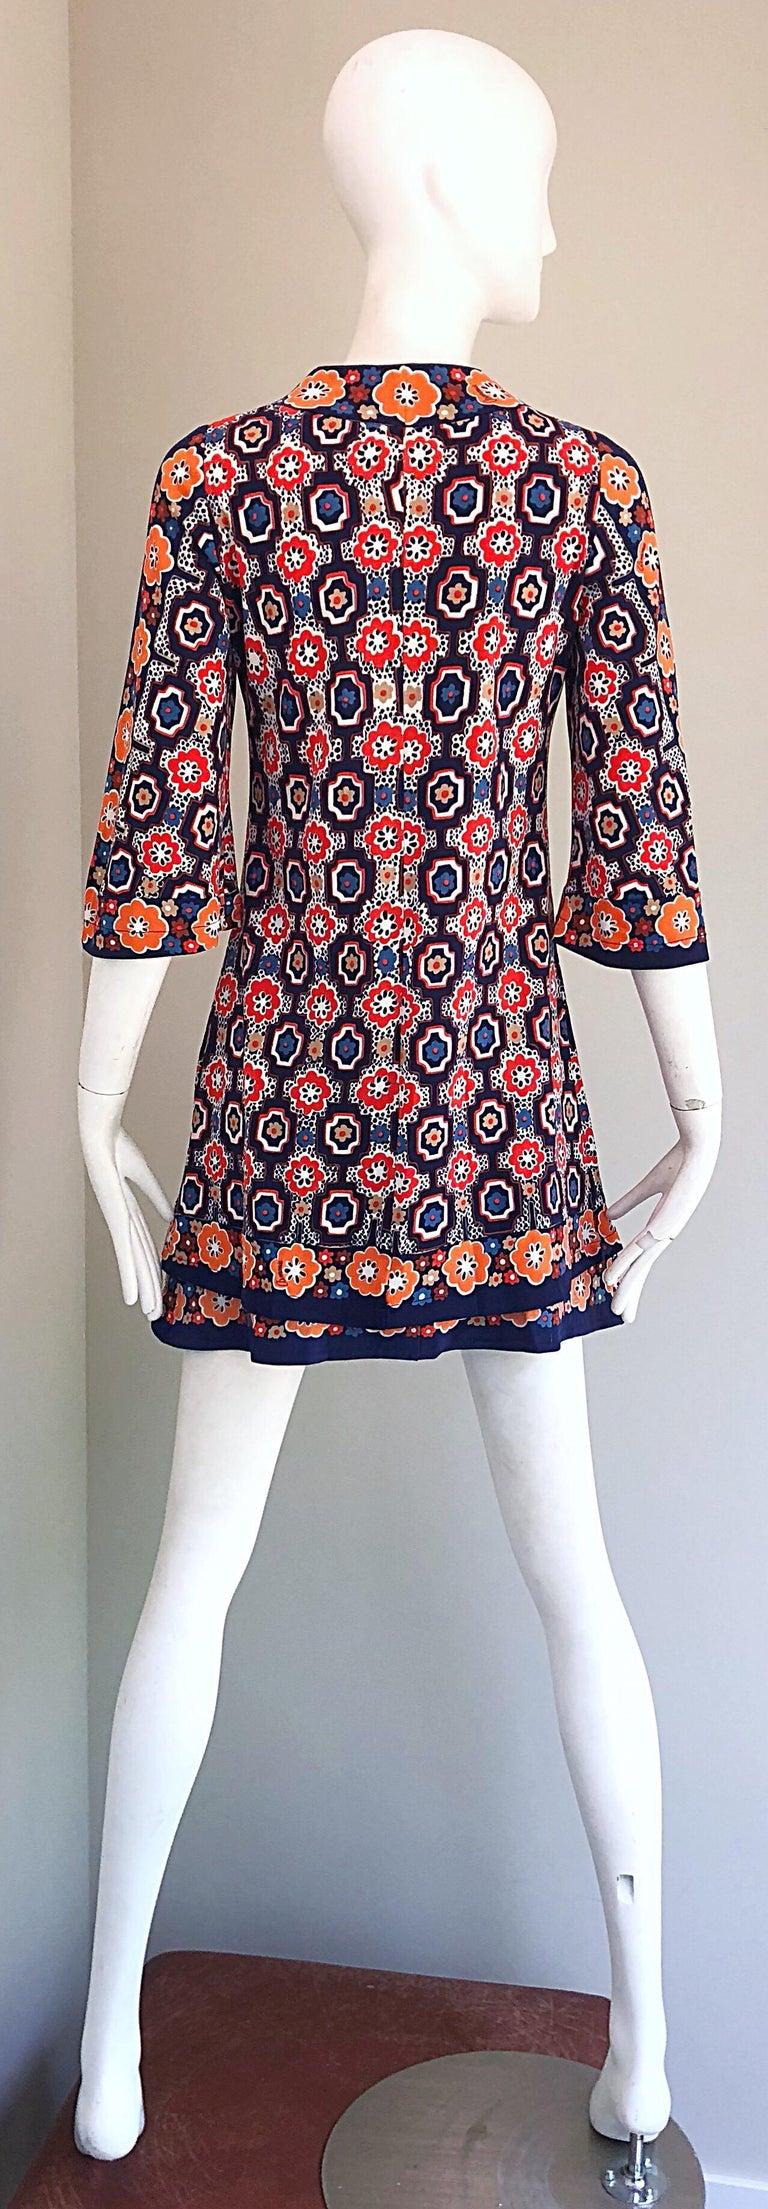 1960s Armonia Italian Jersey Bell Sleeve Vintage 60s Mod Tunic + Mini Skirt For Sale 9